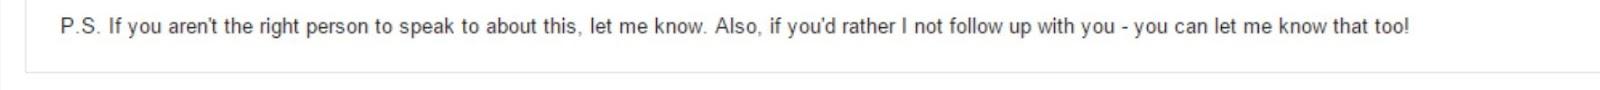 a genius post-script in a sales email